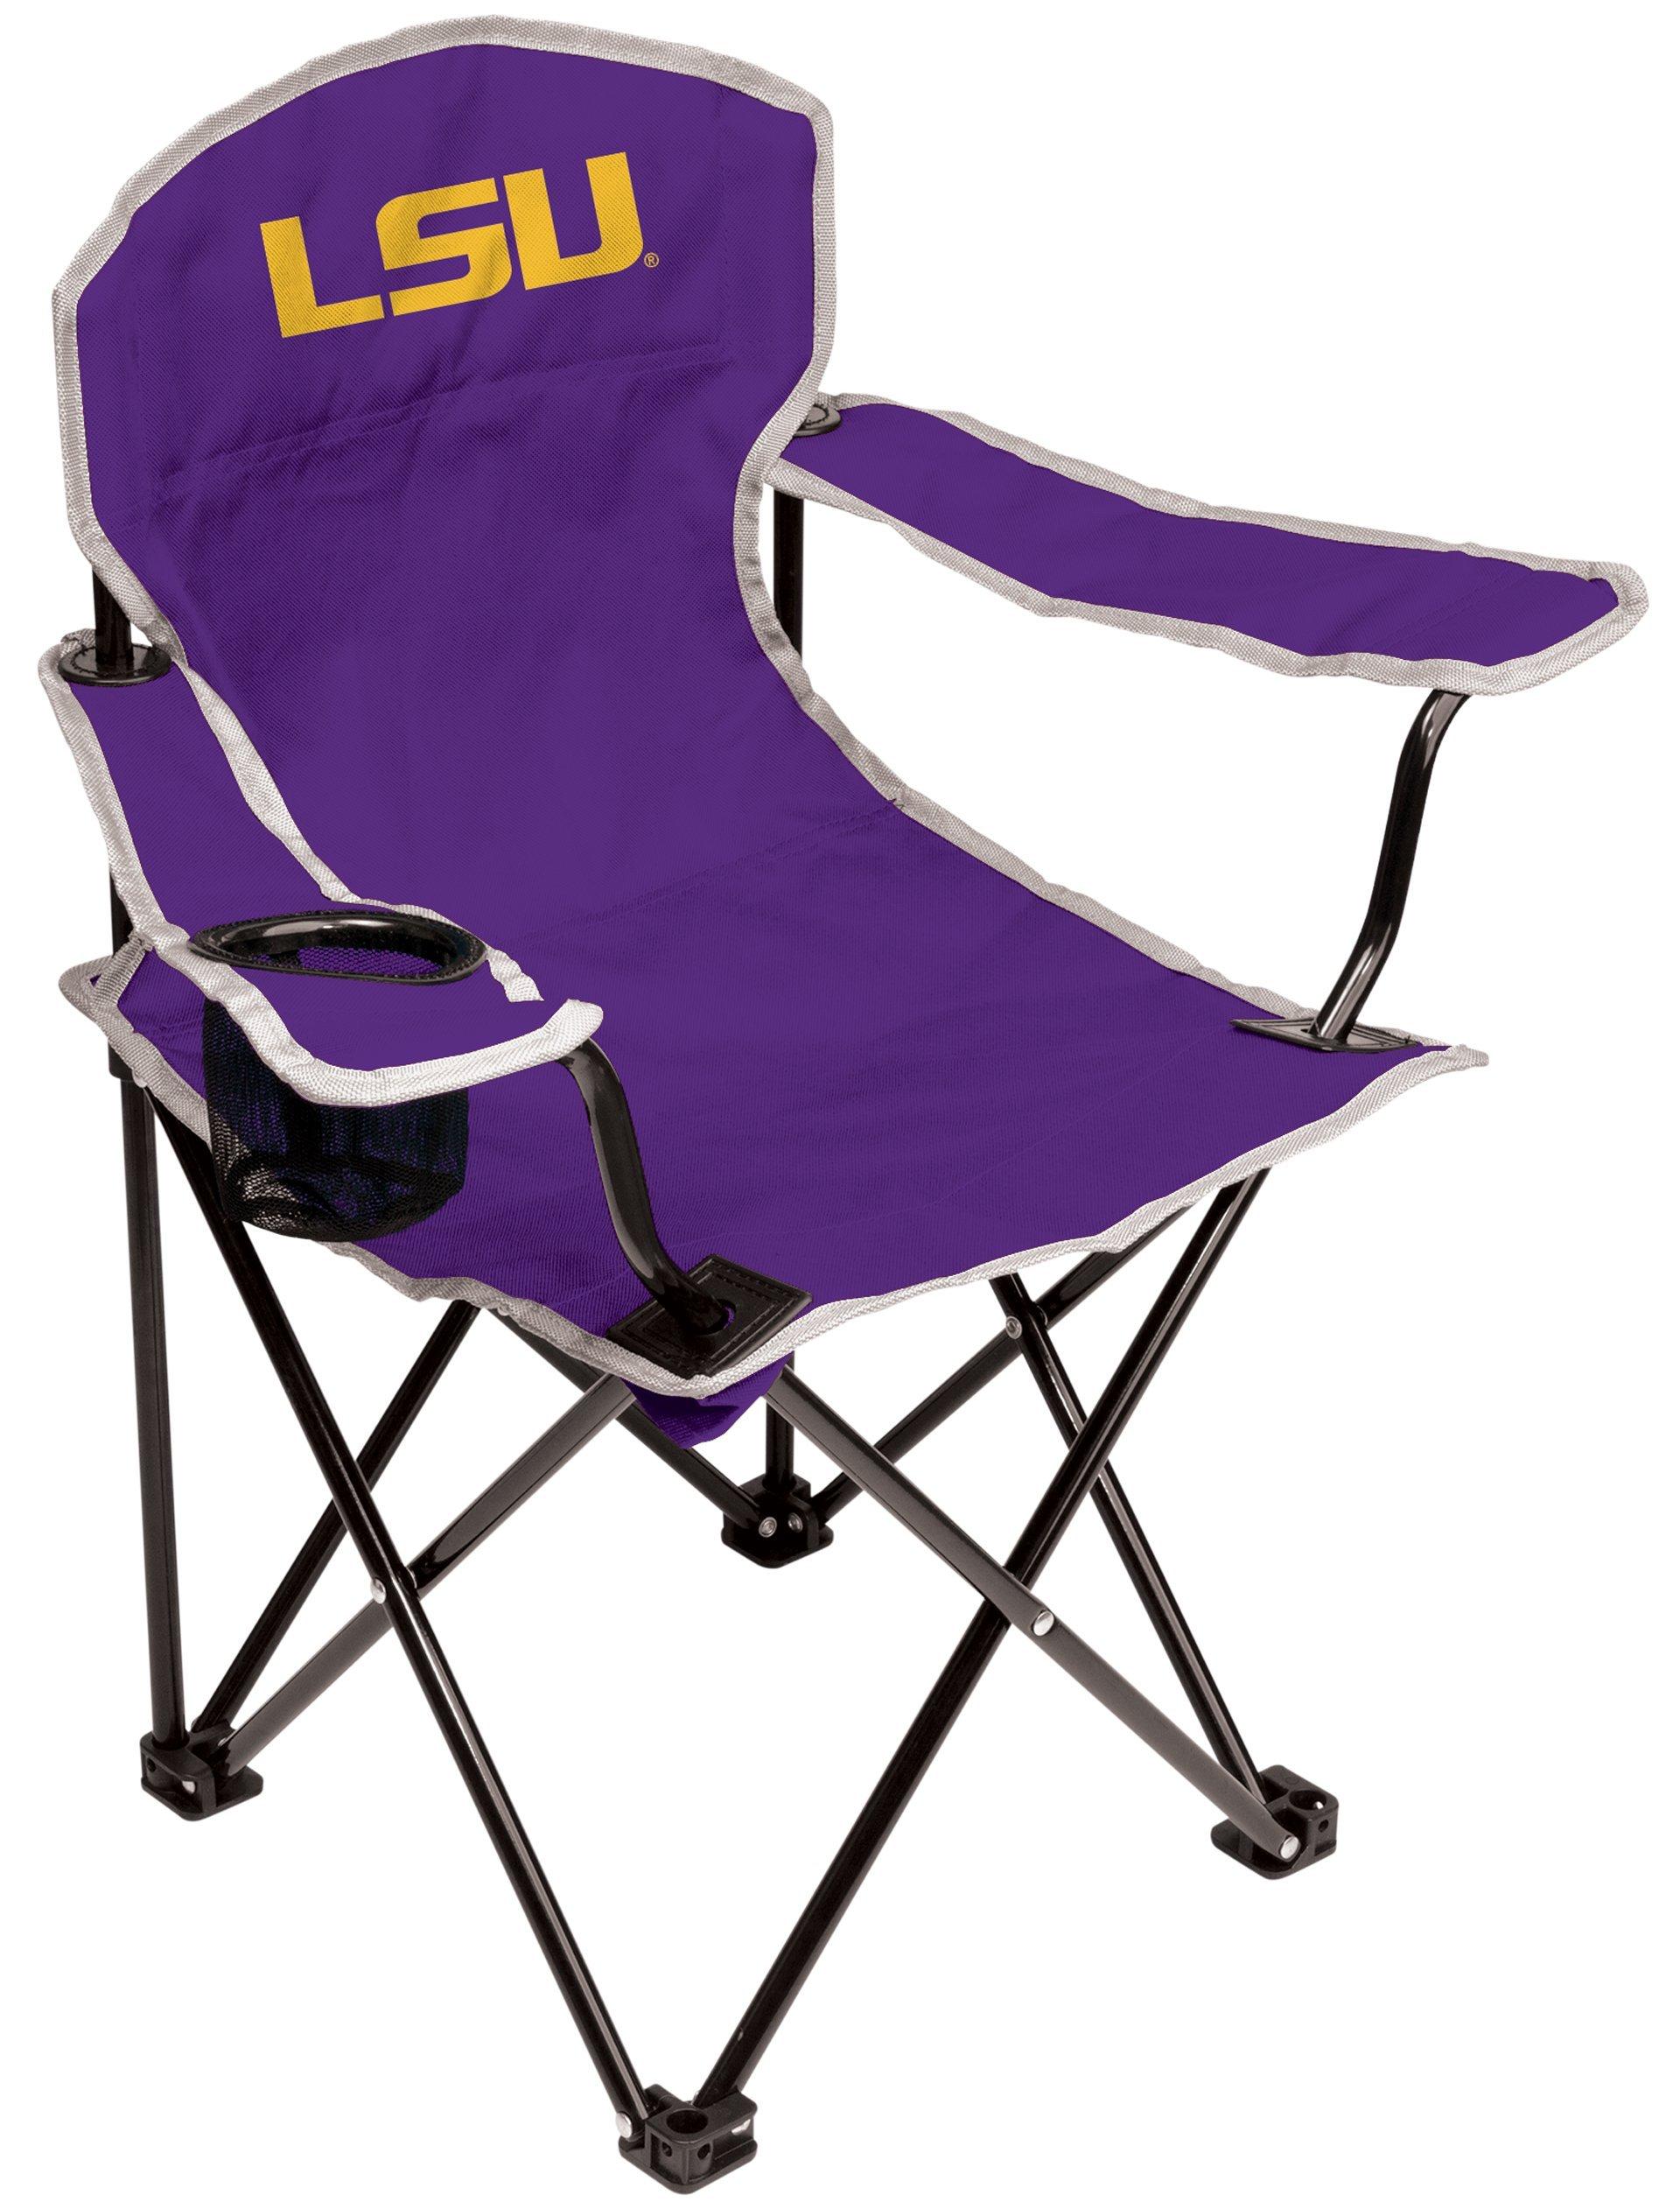 NCAA LSU Tigers Youth Folding Chair, Purple